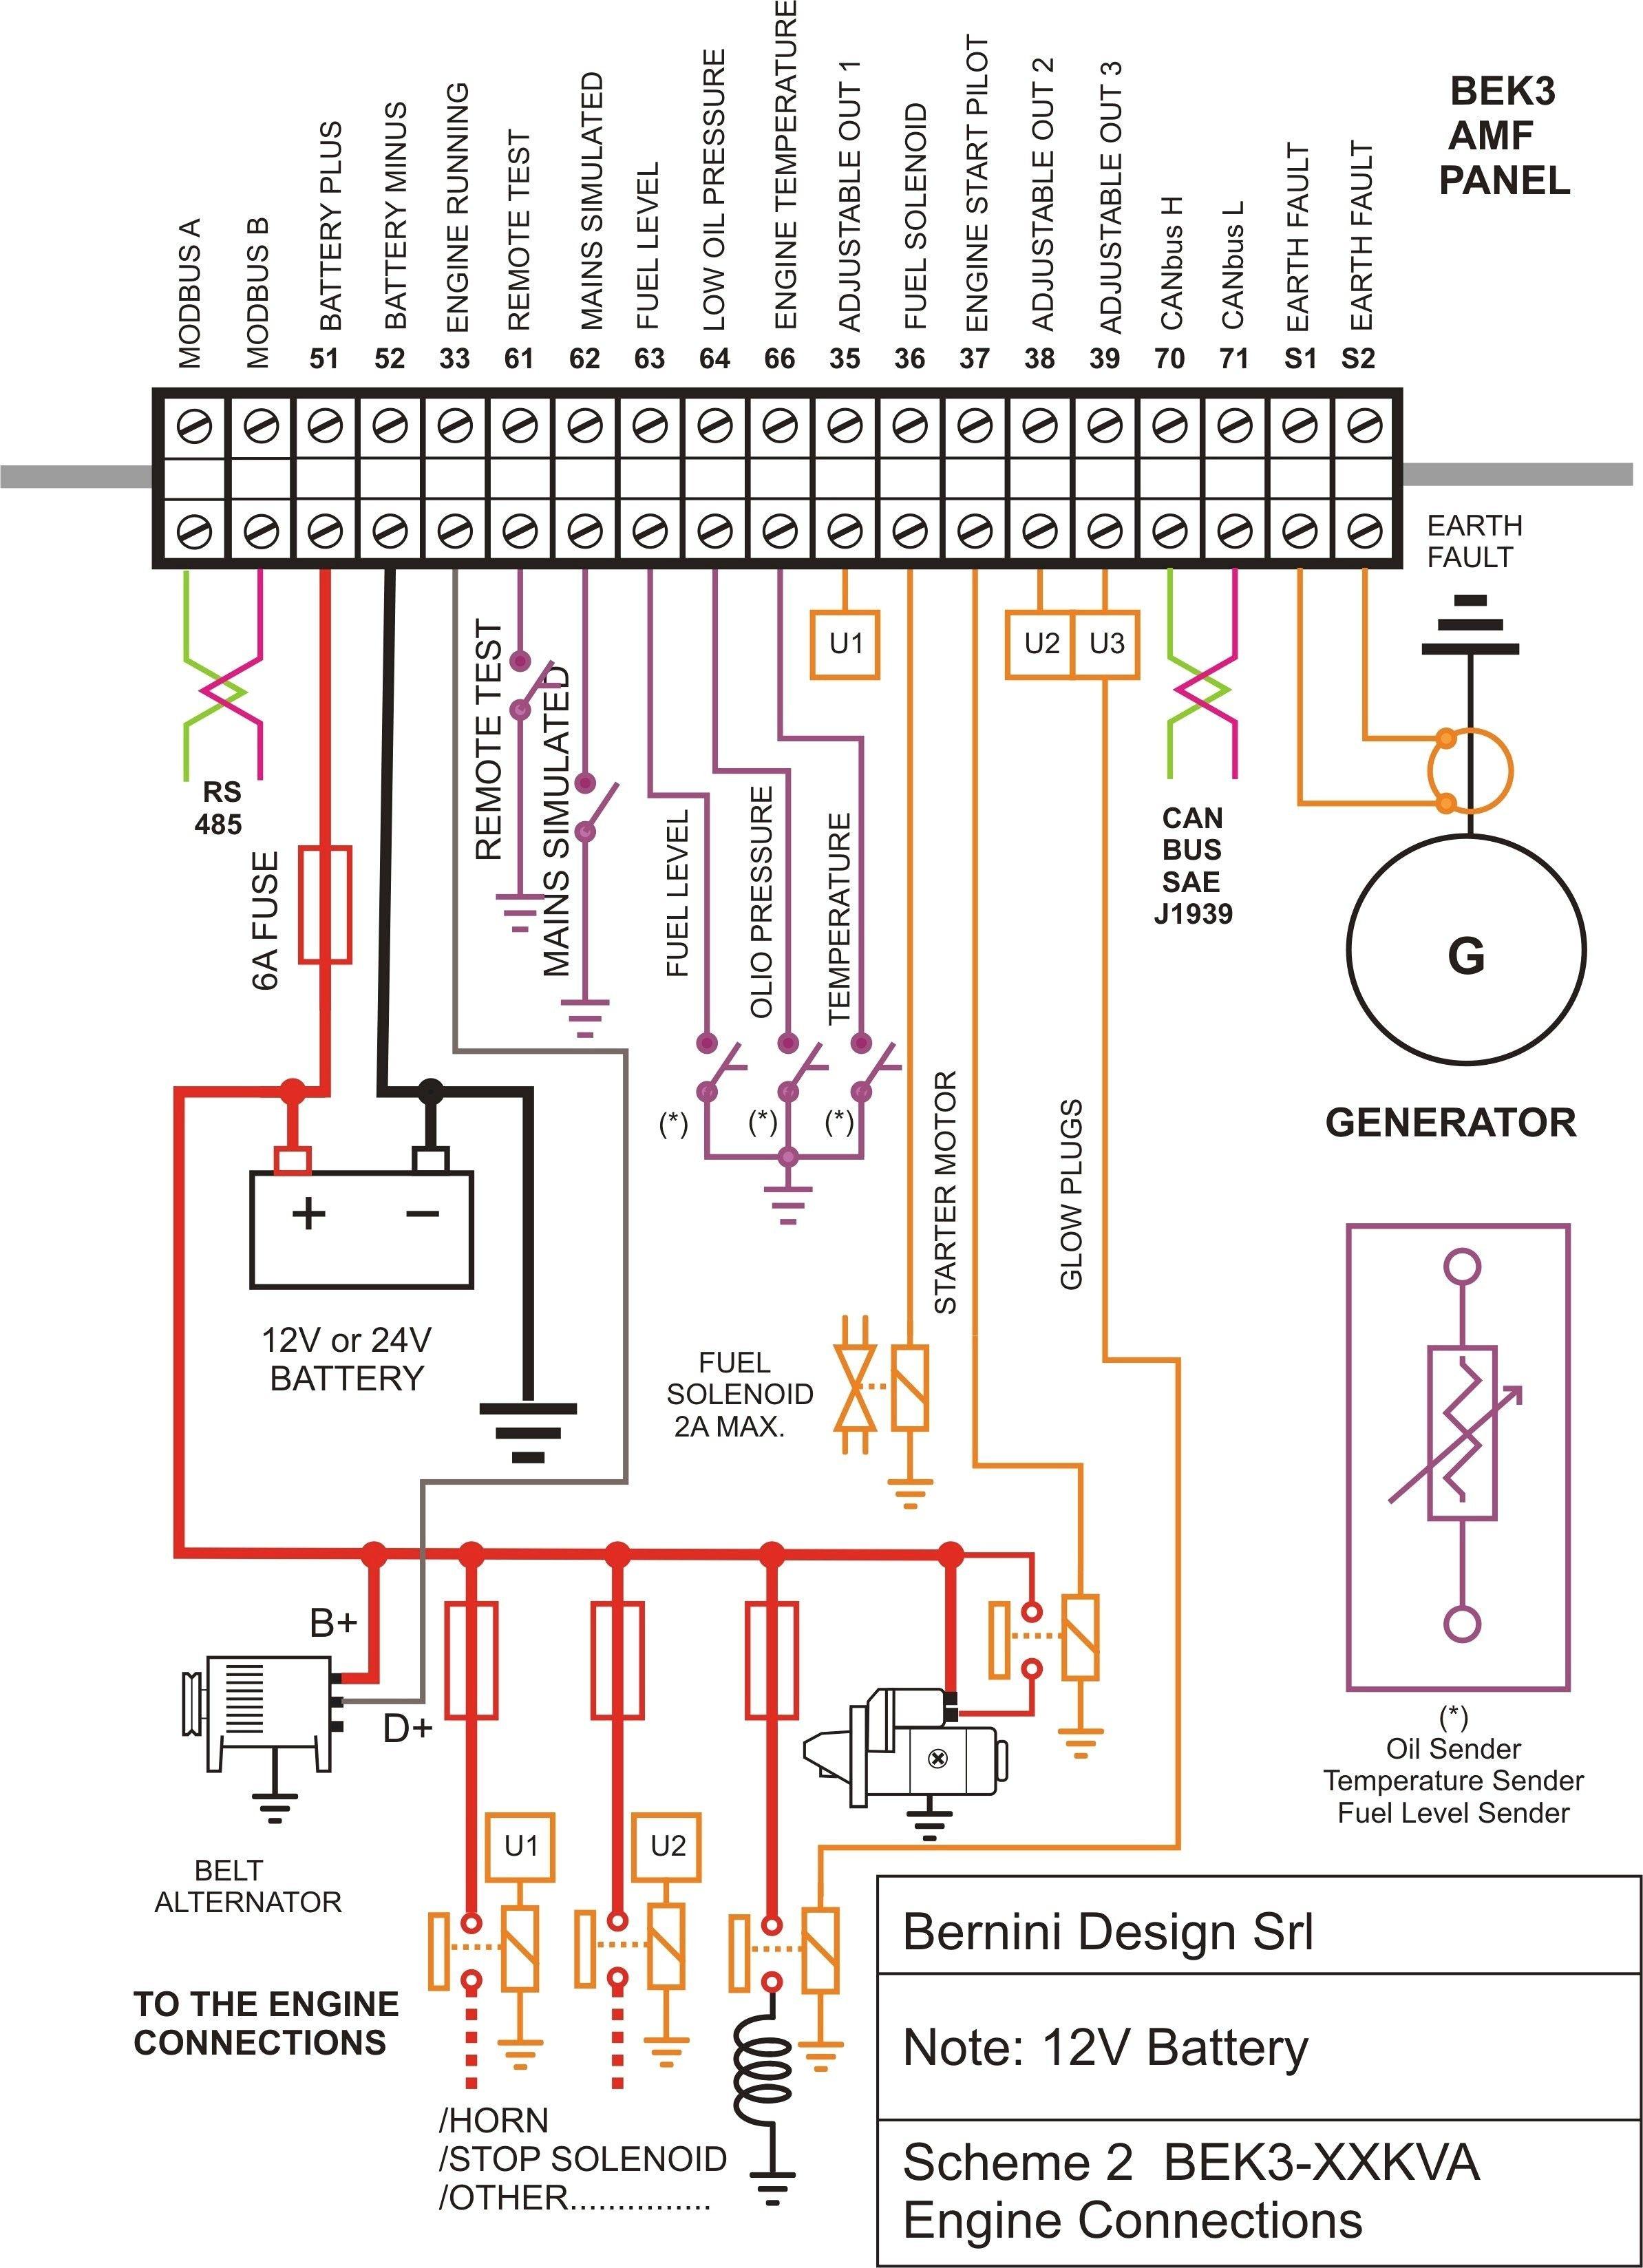 Luxury Free Wiring Diagram Sample Mac Diagrams Digramssample Diagramimages Electrical Circuit Diagram Electrical Wiring Diagram Circuit Diagram